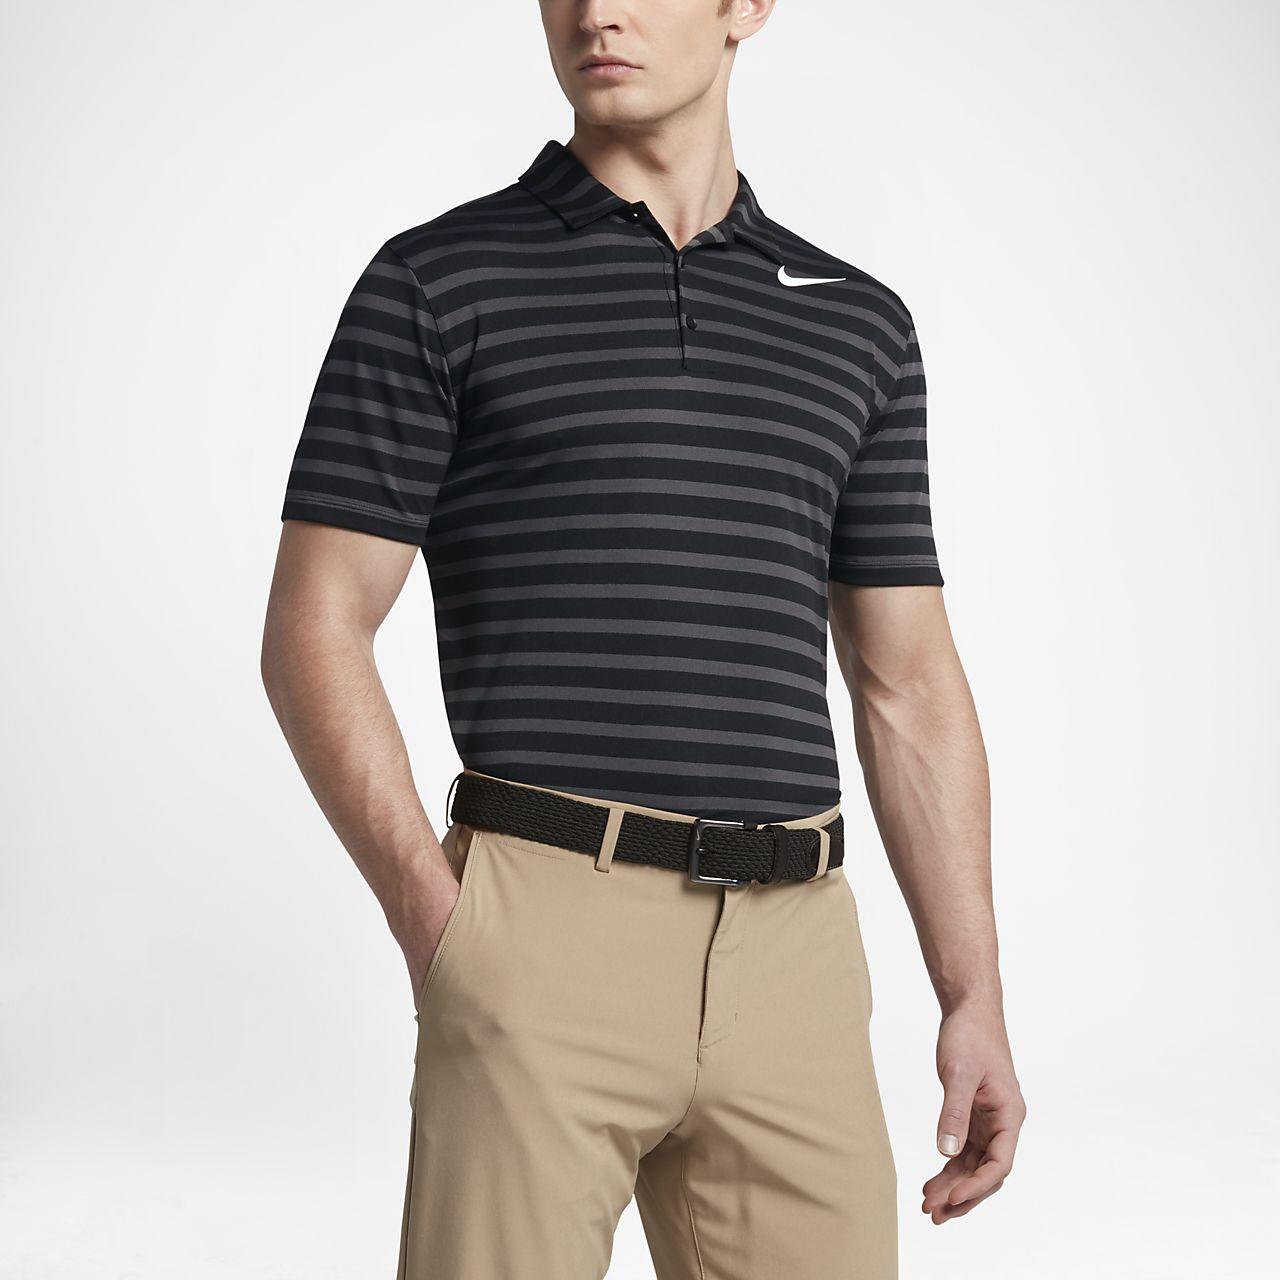 Nike Breathe Stripe Men's Standard Fit Golf Polo Shirts Black/White